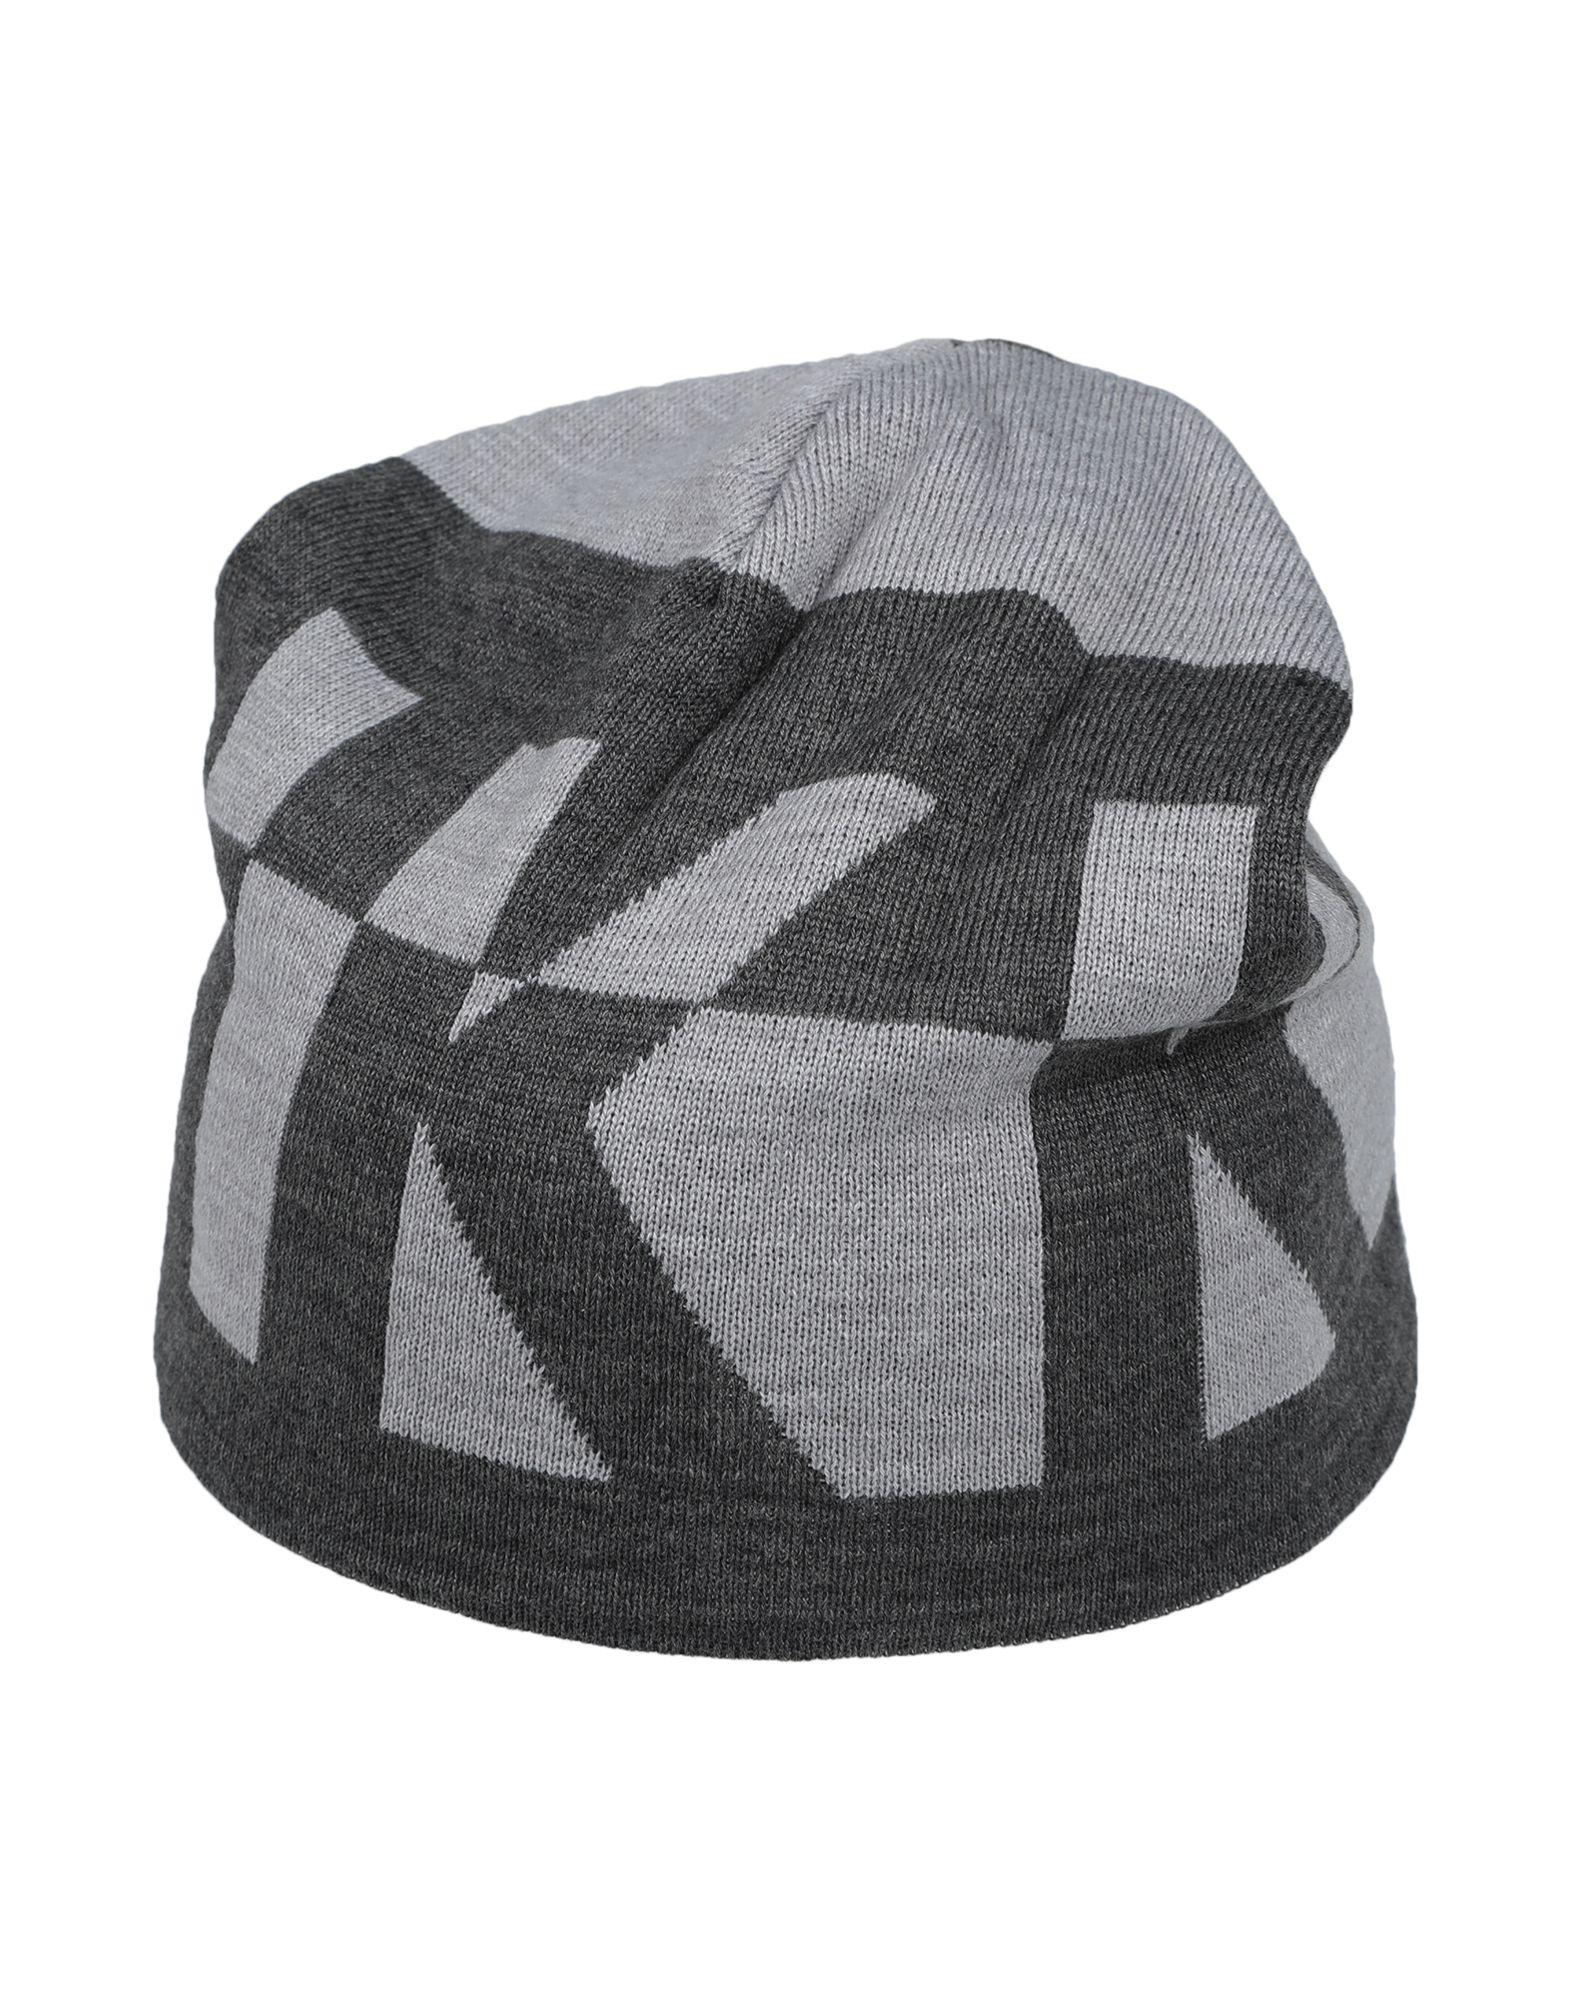 Cappello Bikkembergs Uomo - Acquista online su YOOX - 46623176VX c0952e024481